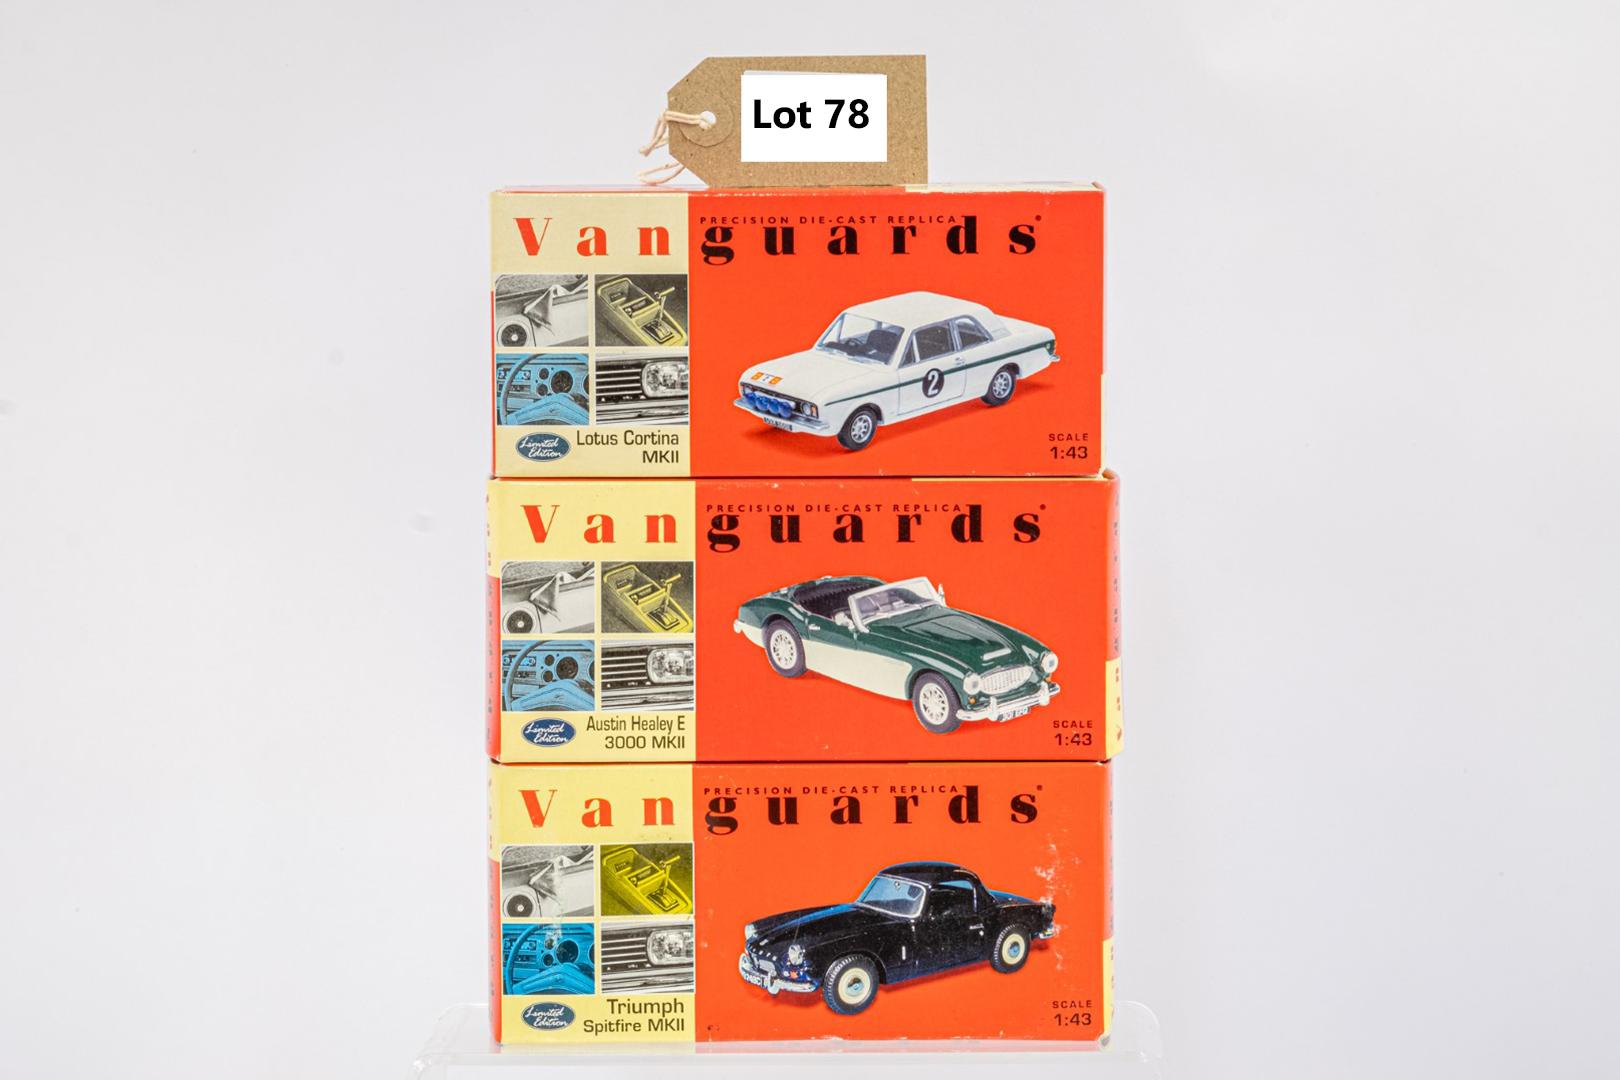 Vanguards Triumph Spitfire MKII / Austin Healey E 3000 MKII / Lotus Cortina MKII